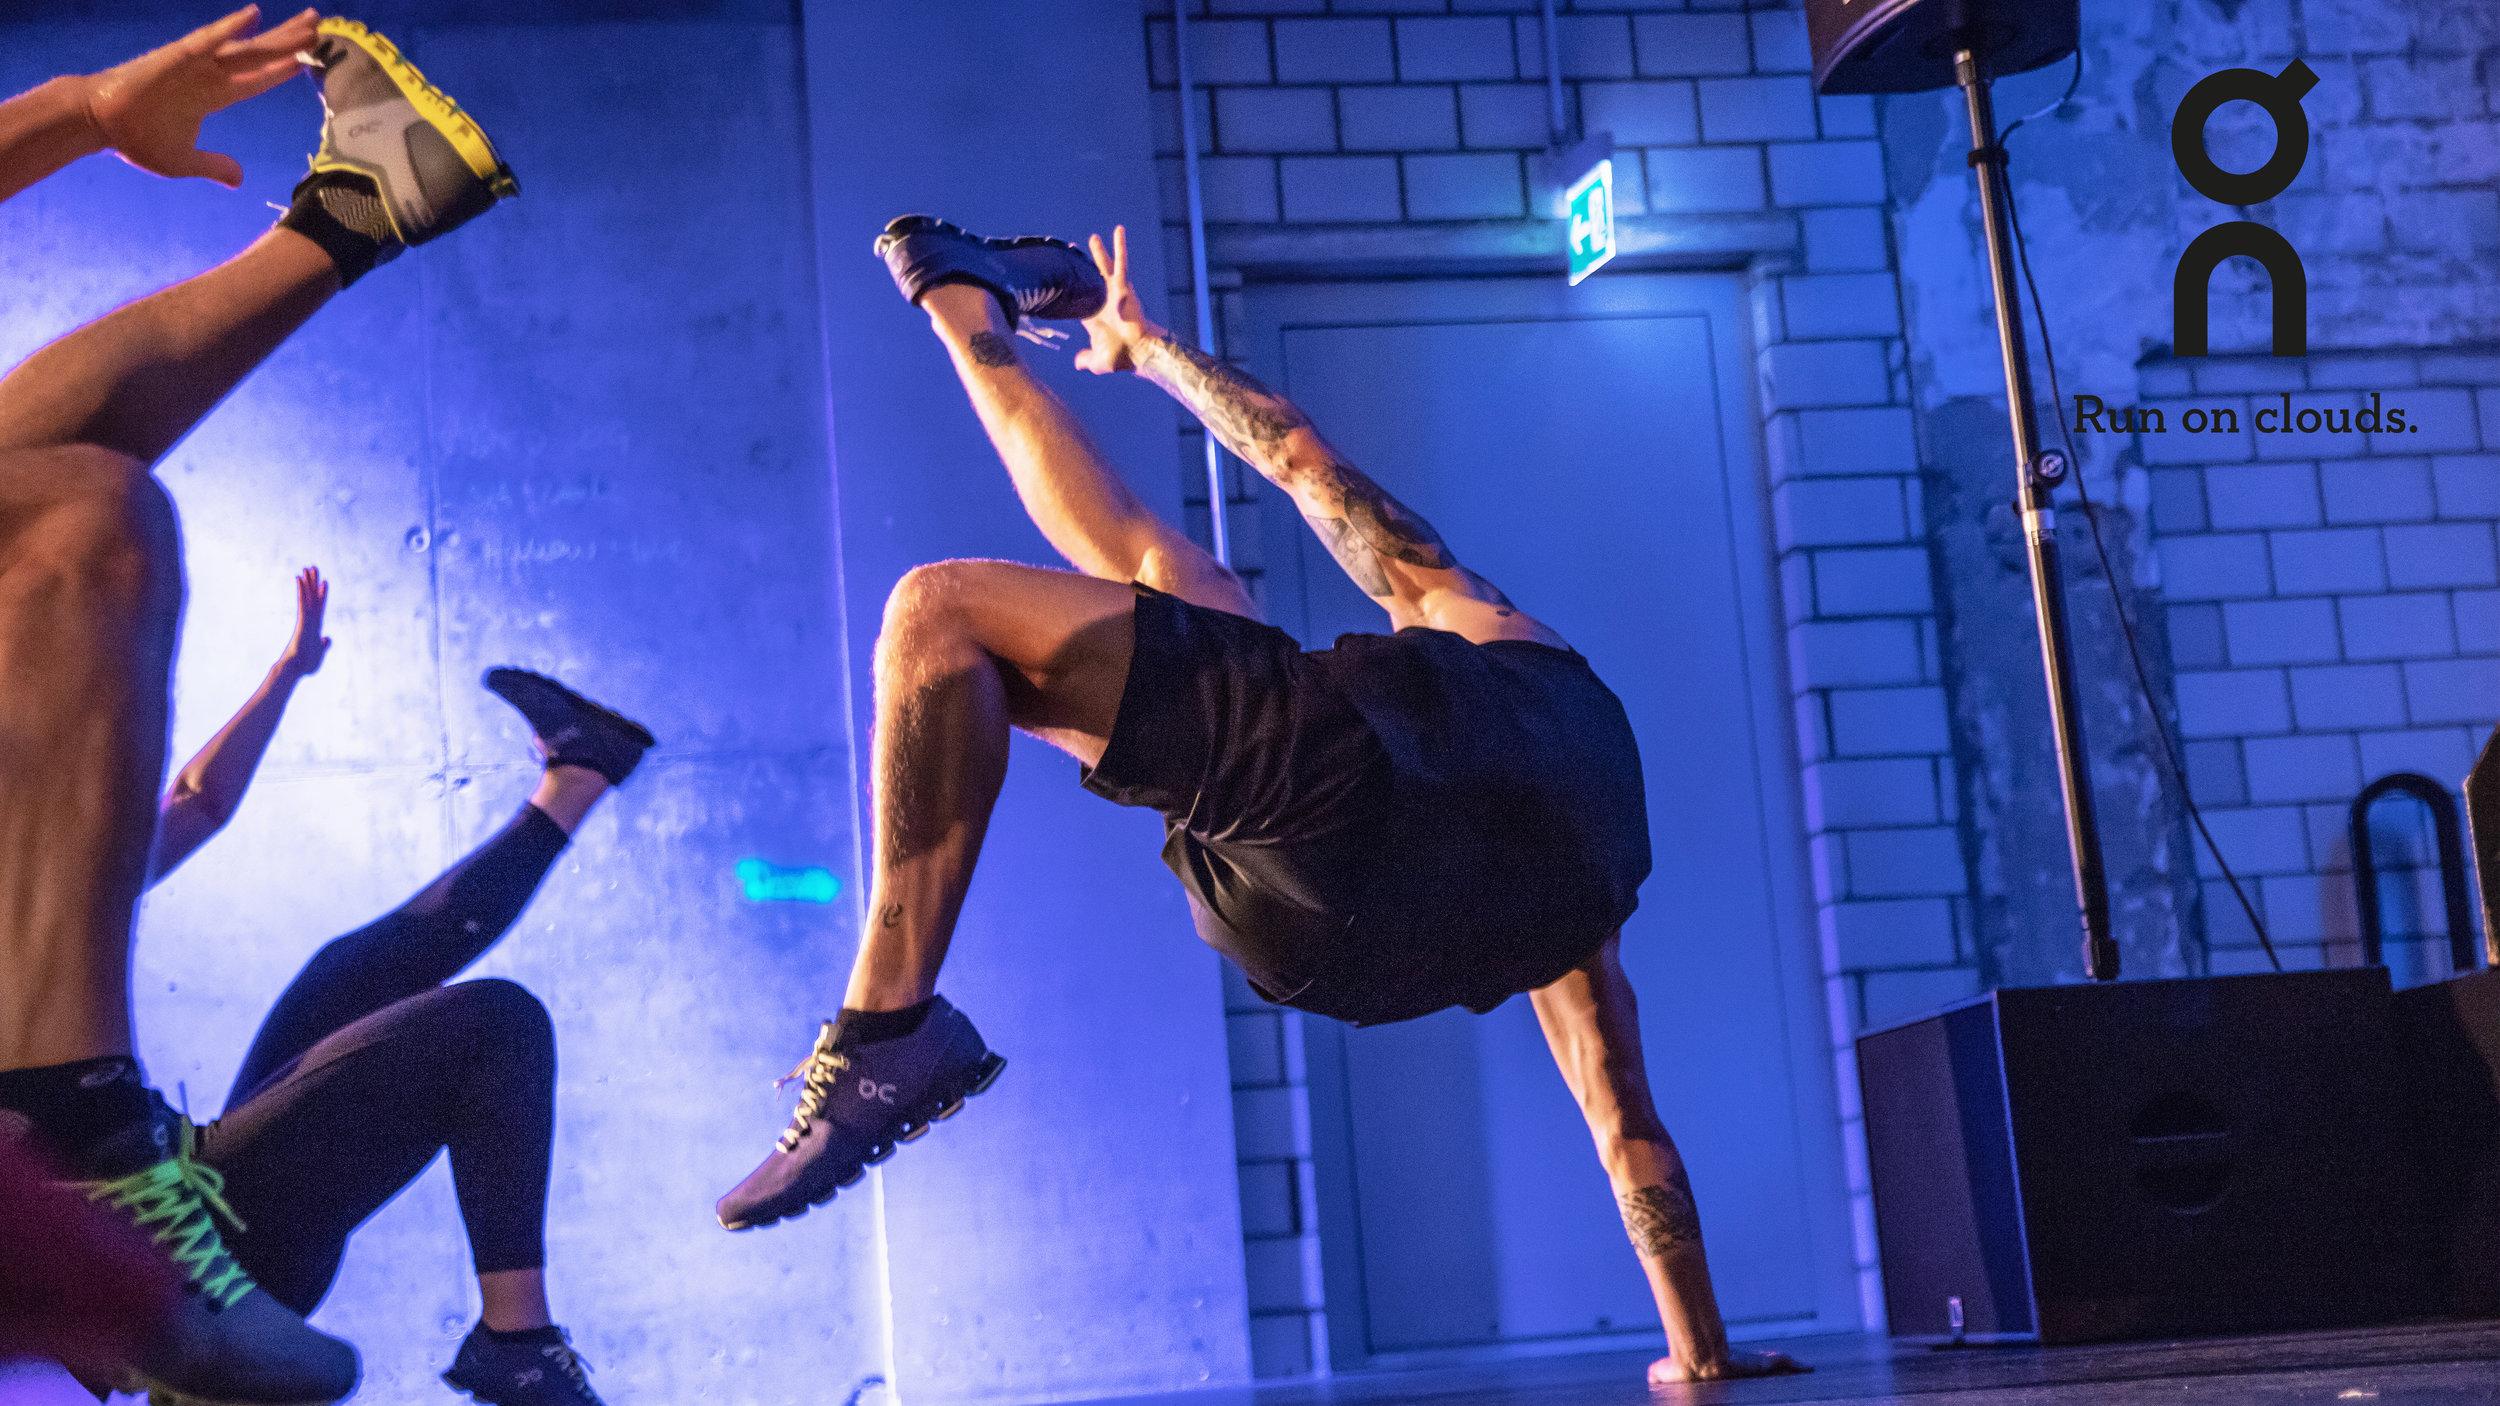 On X Balboa – Live Music Workout